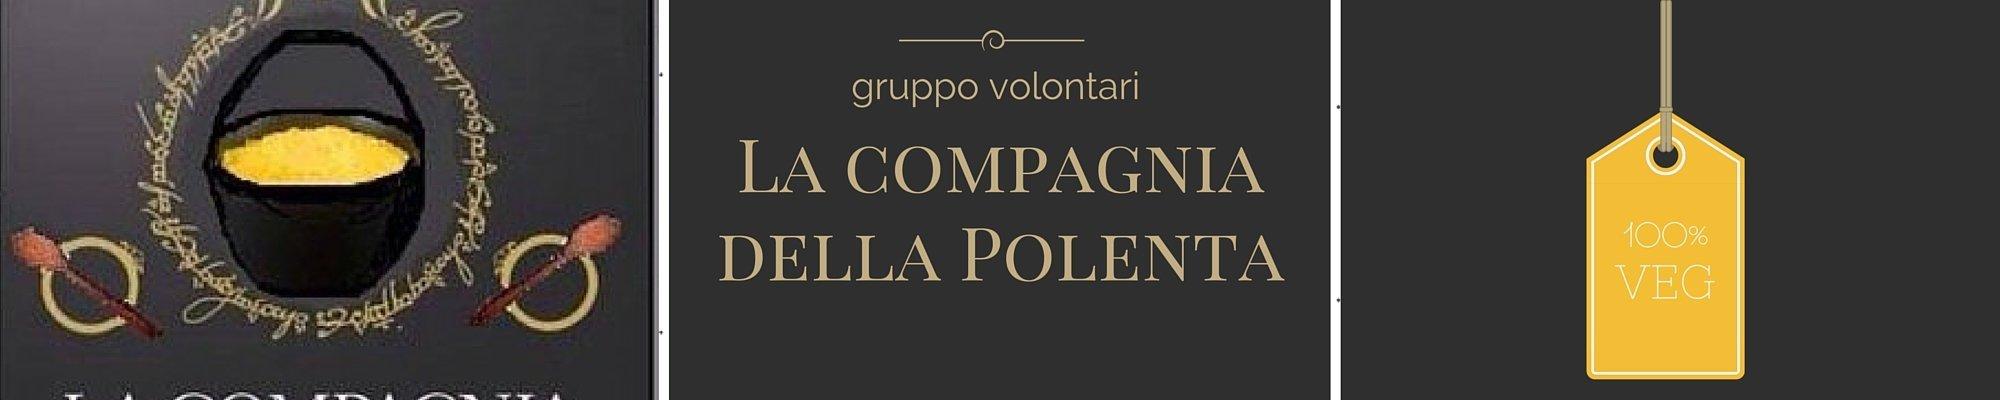 news La Compagnia della polenta